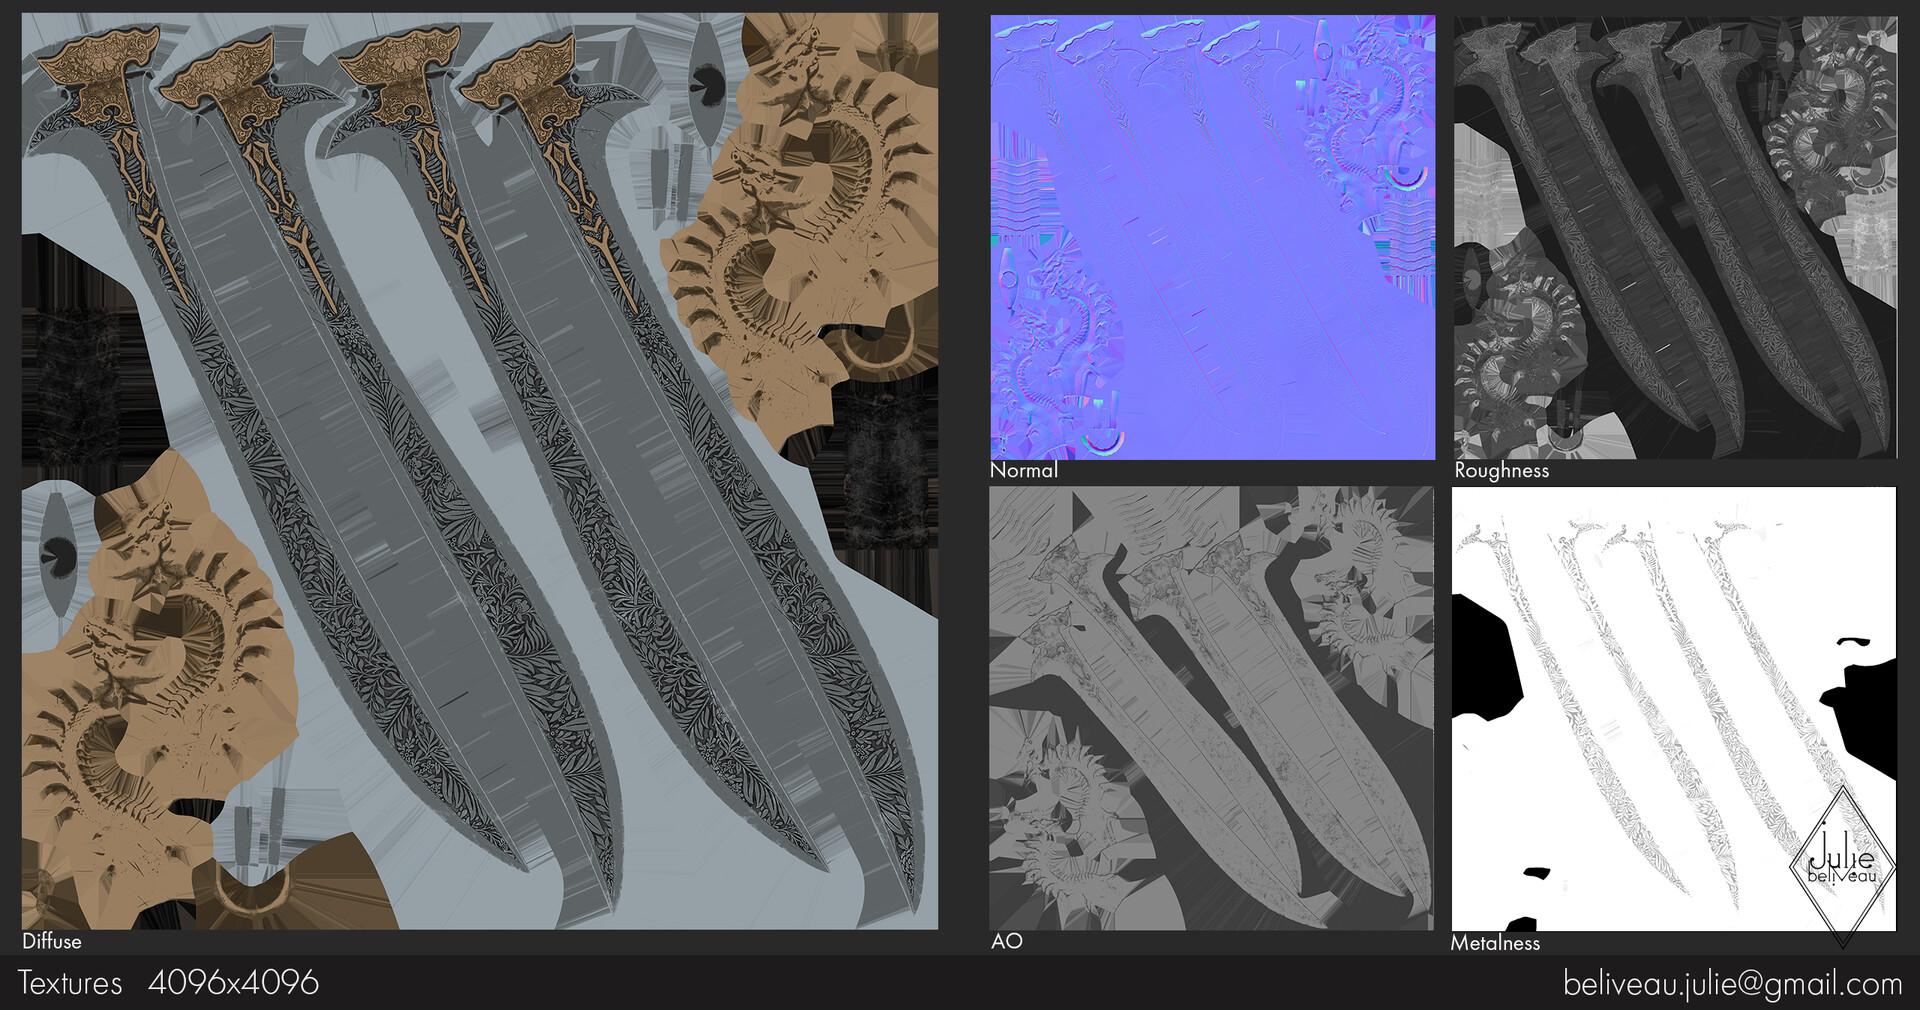 Julie beliveau swords of a celestial maps